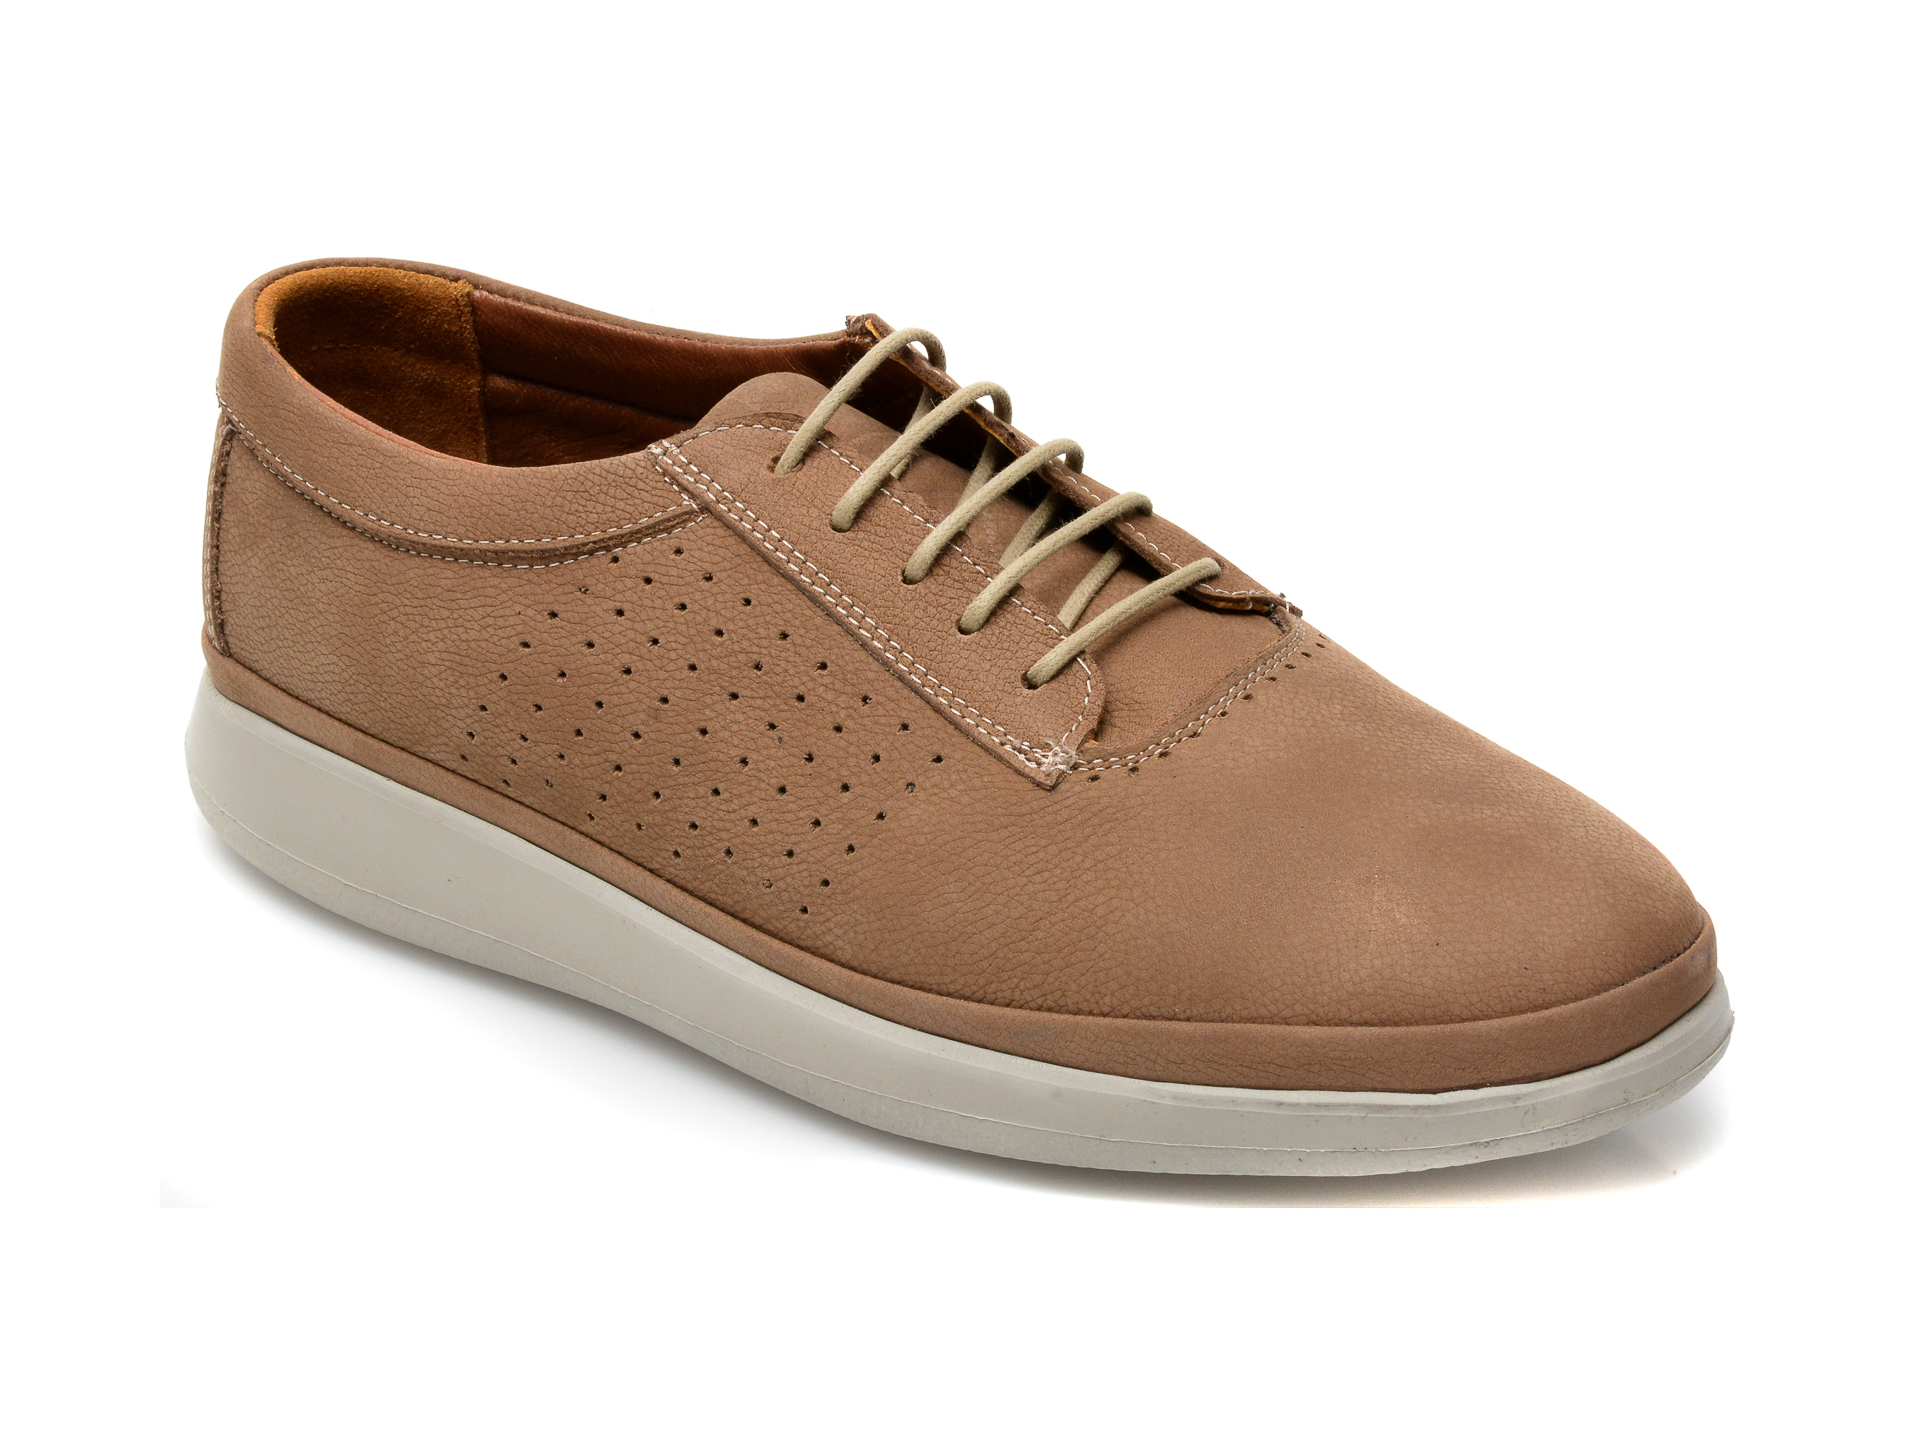 Pantofi Otter Maro, M6001, Din Nabuc